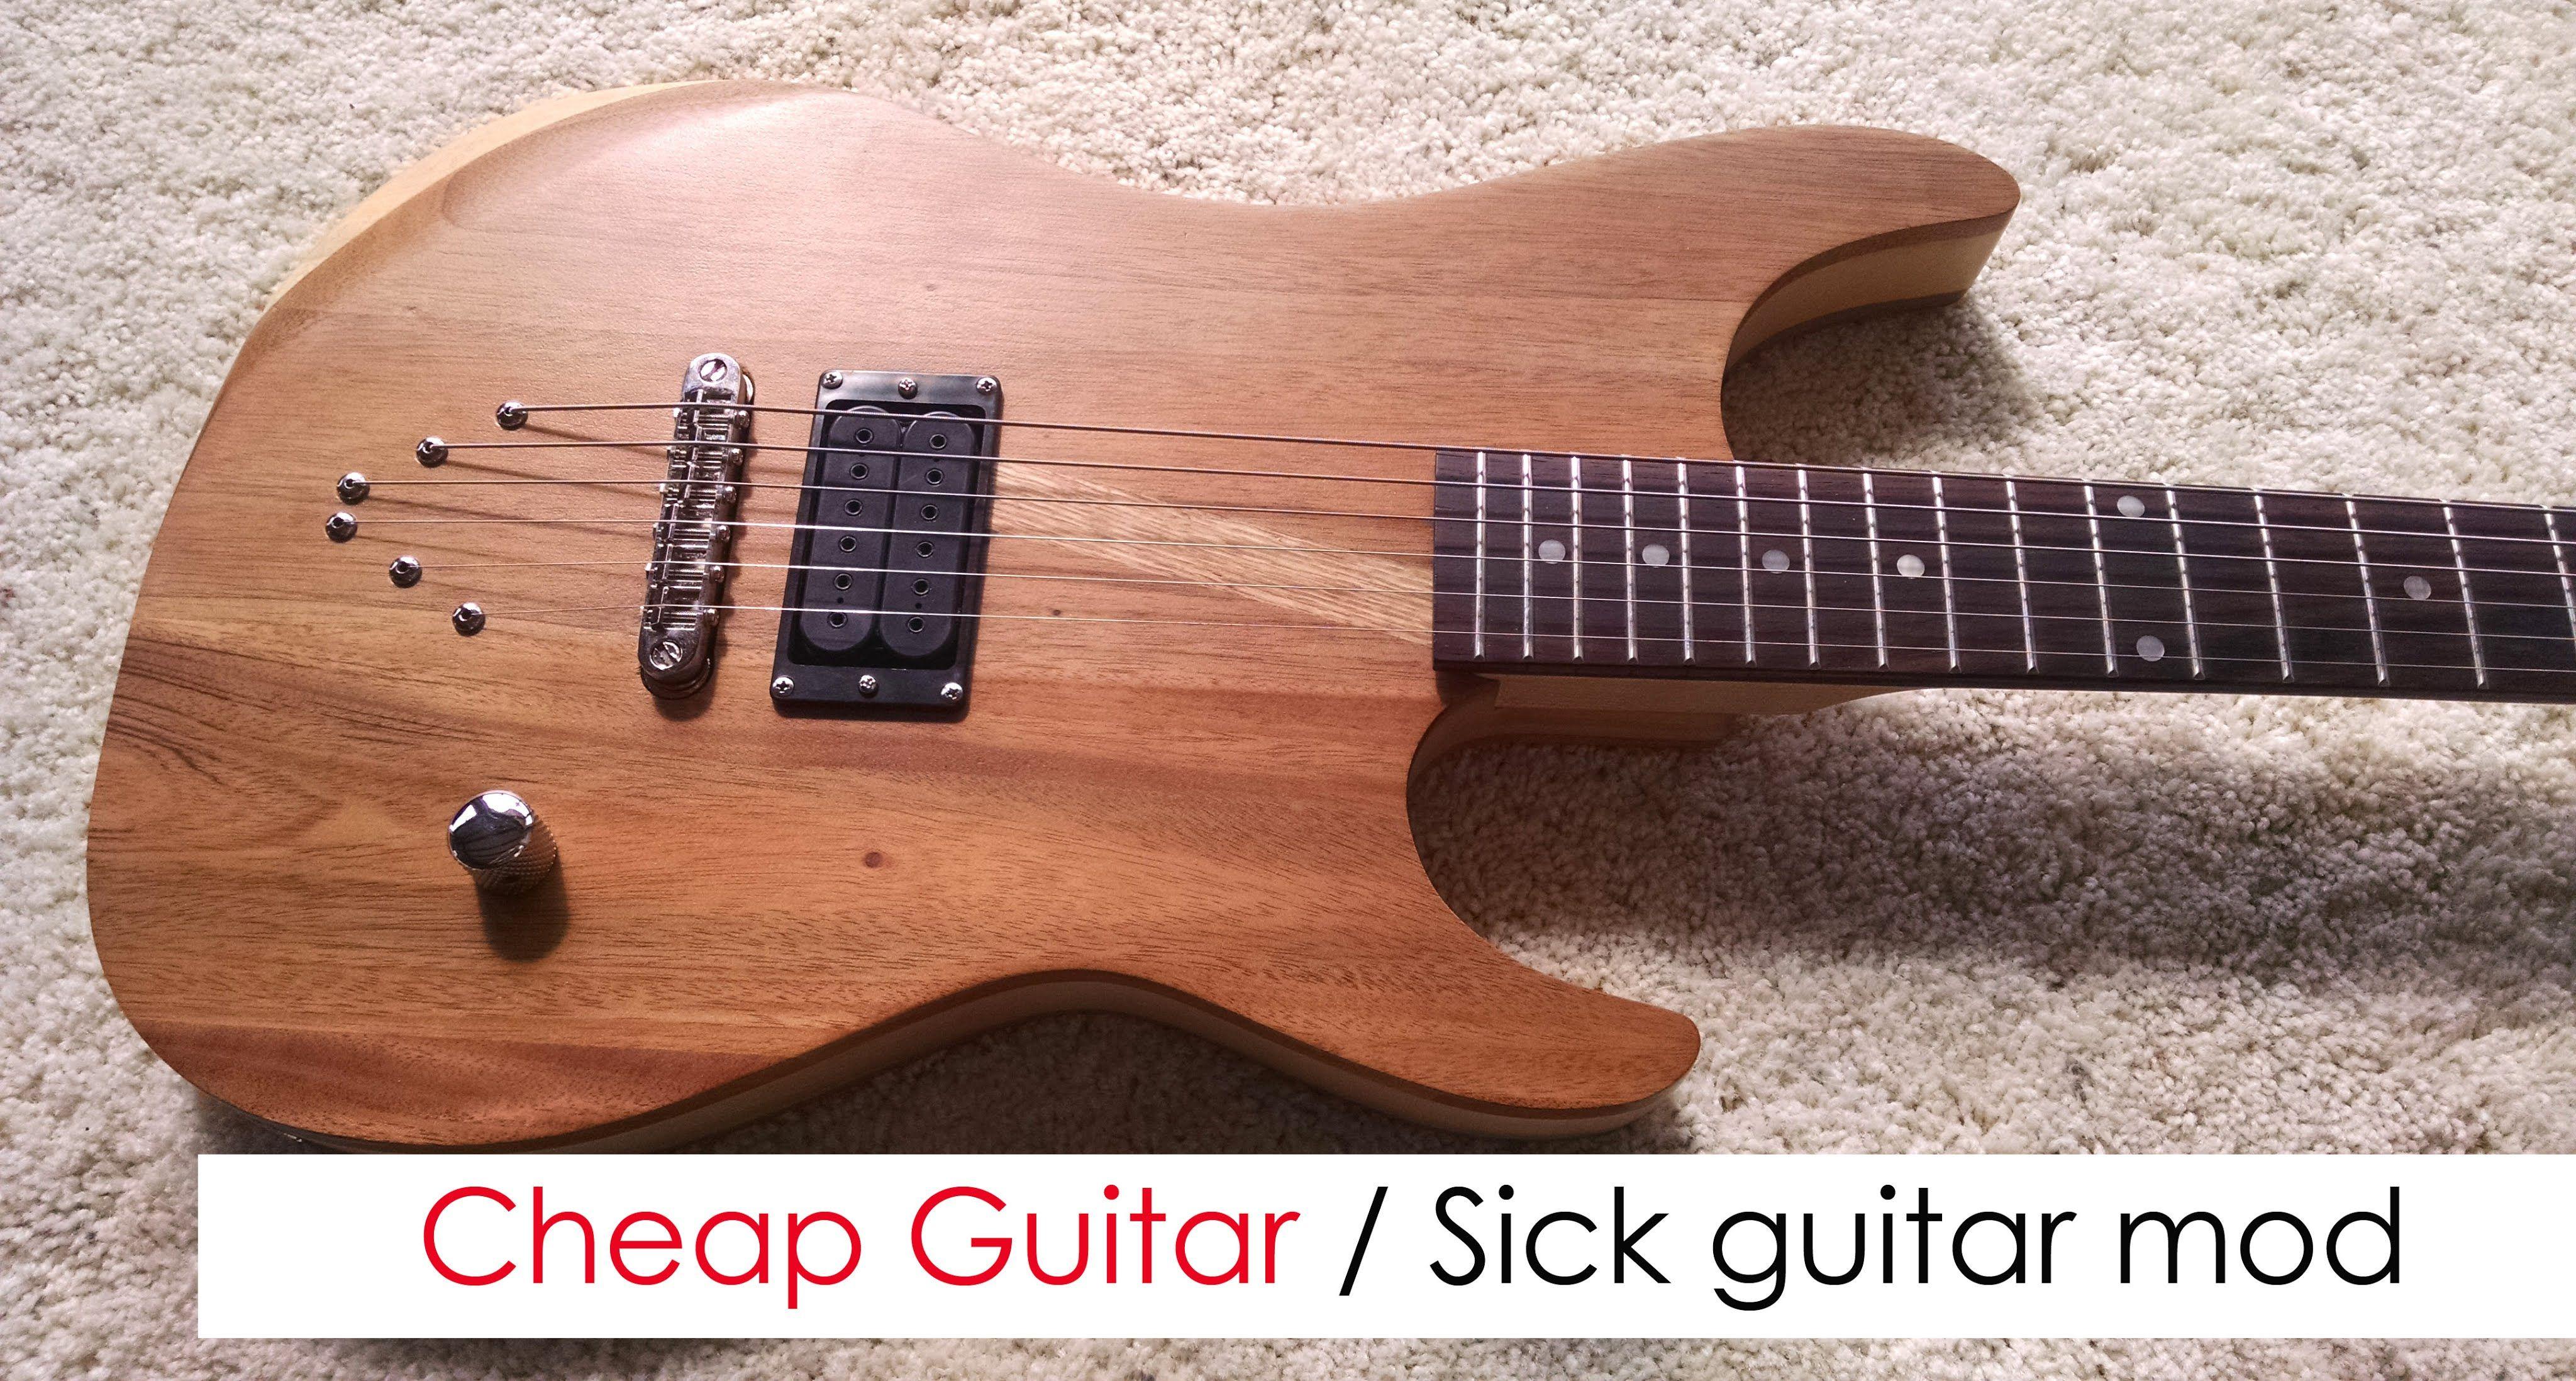 guitar #customguitar Cheap guitar / Sick guitar. Custom guitar mod ...